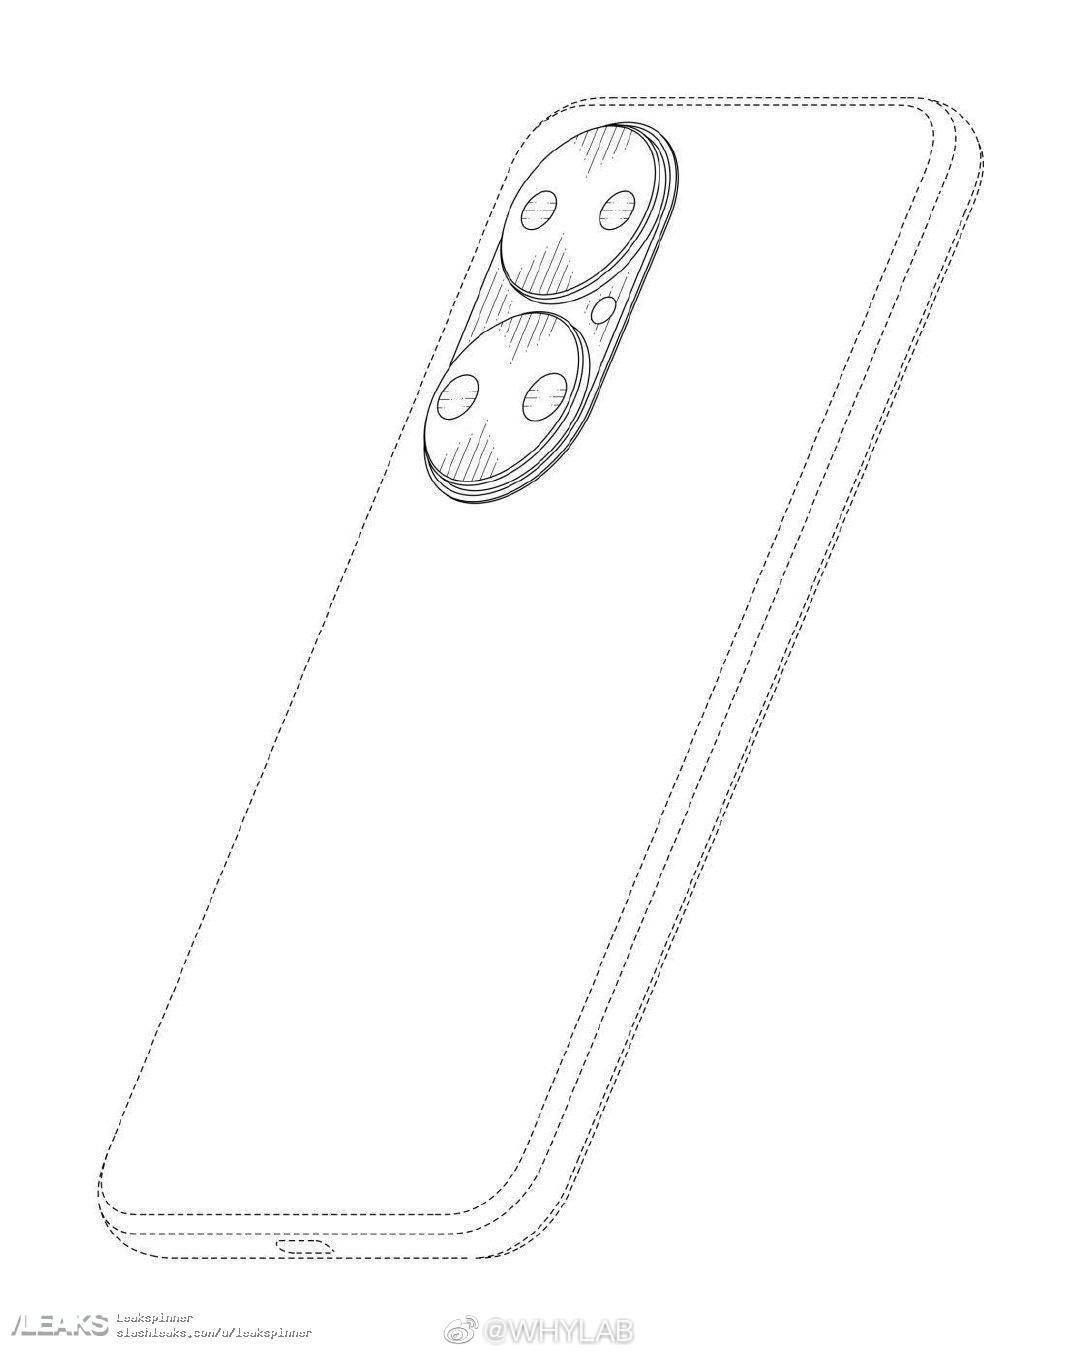 Schemat Huawei P50 tył